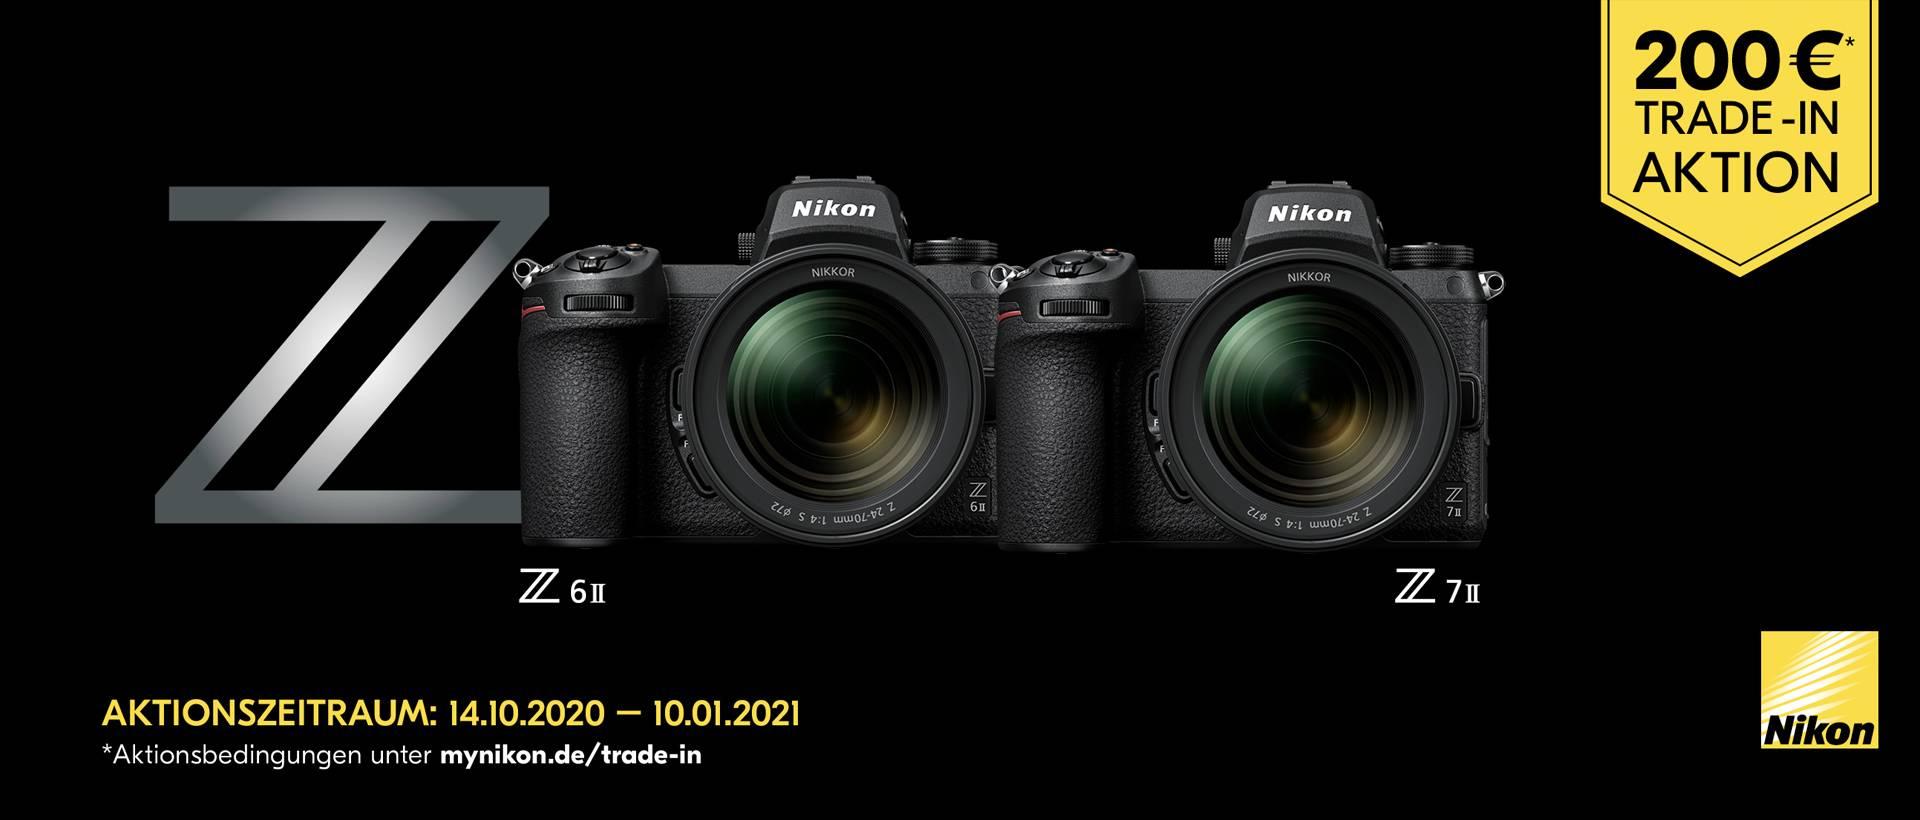 Nikon Z7 II / Z6 II Trade-In